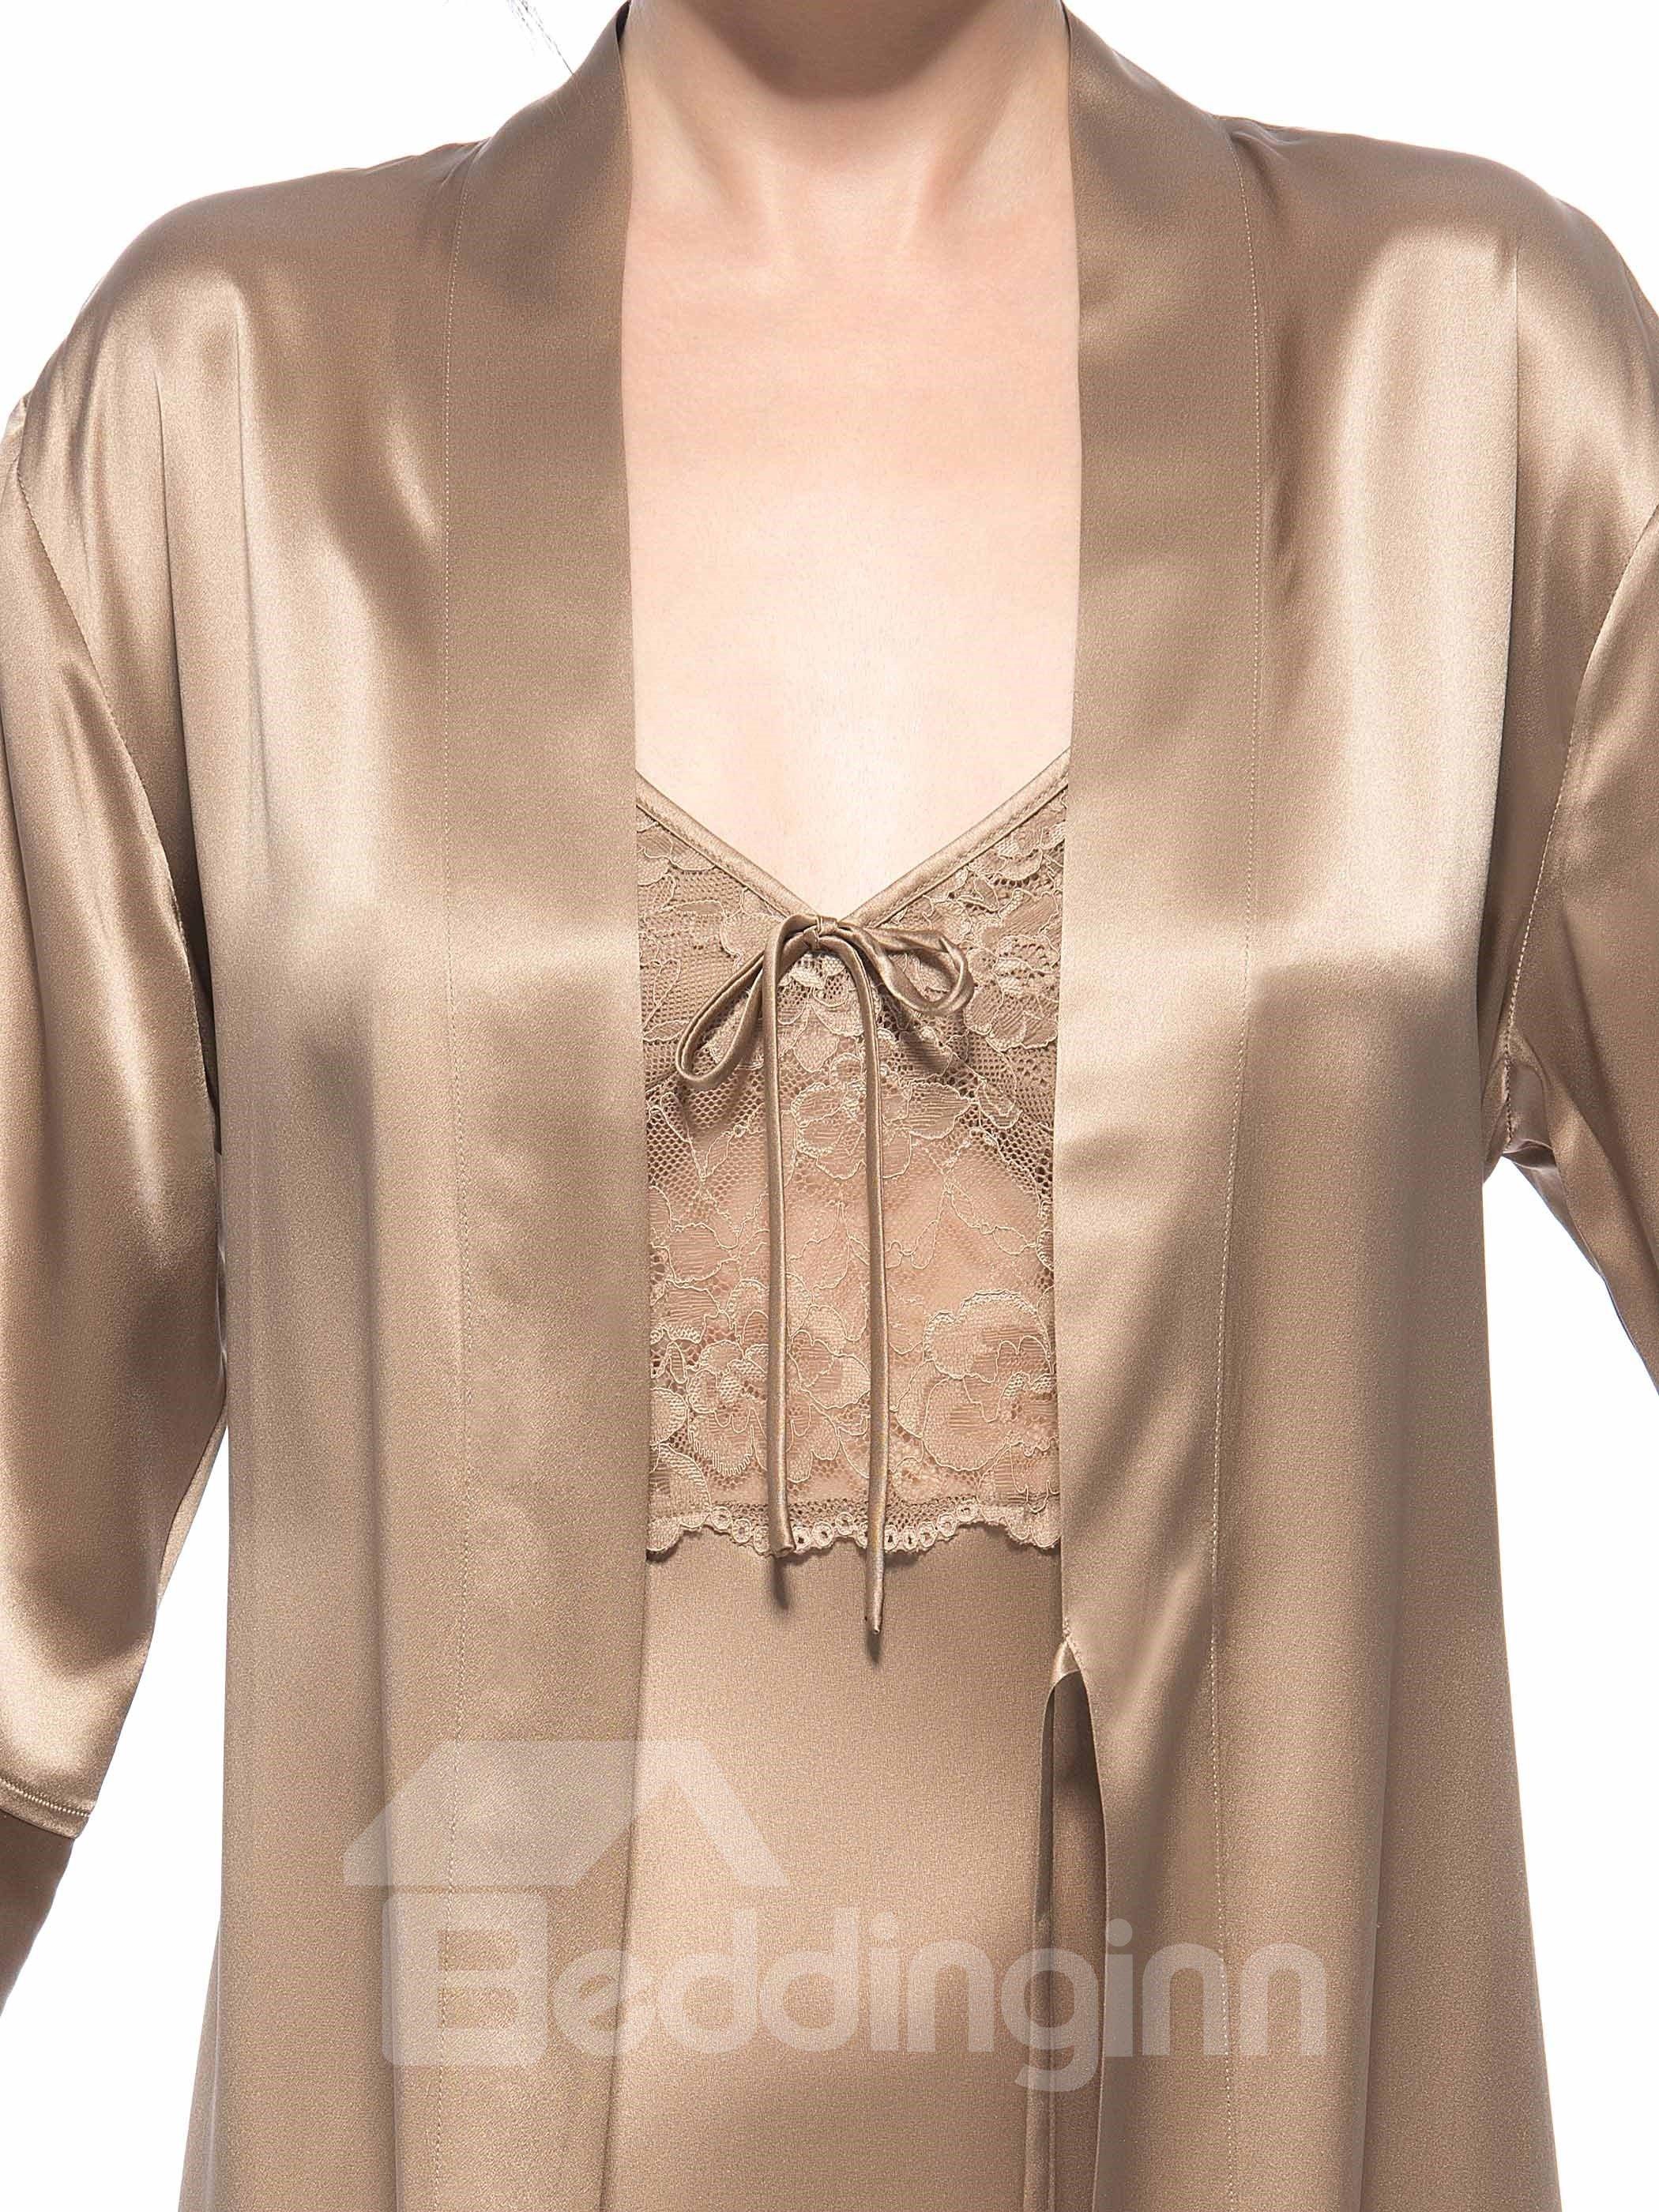 Pretty Wonderful High Classic Lace Bodice Belted Open Cuff Robe